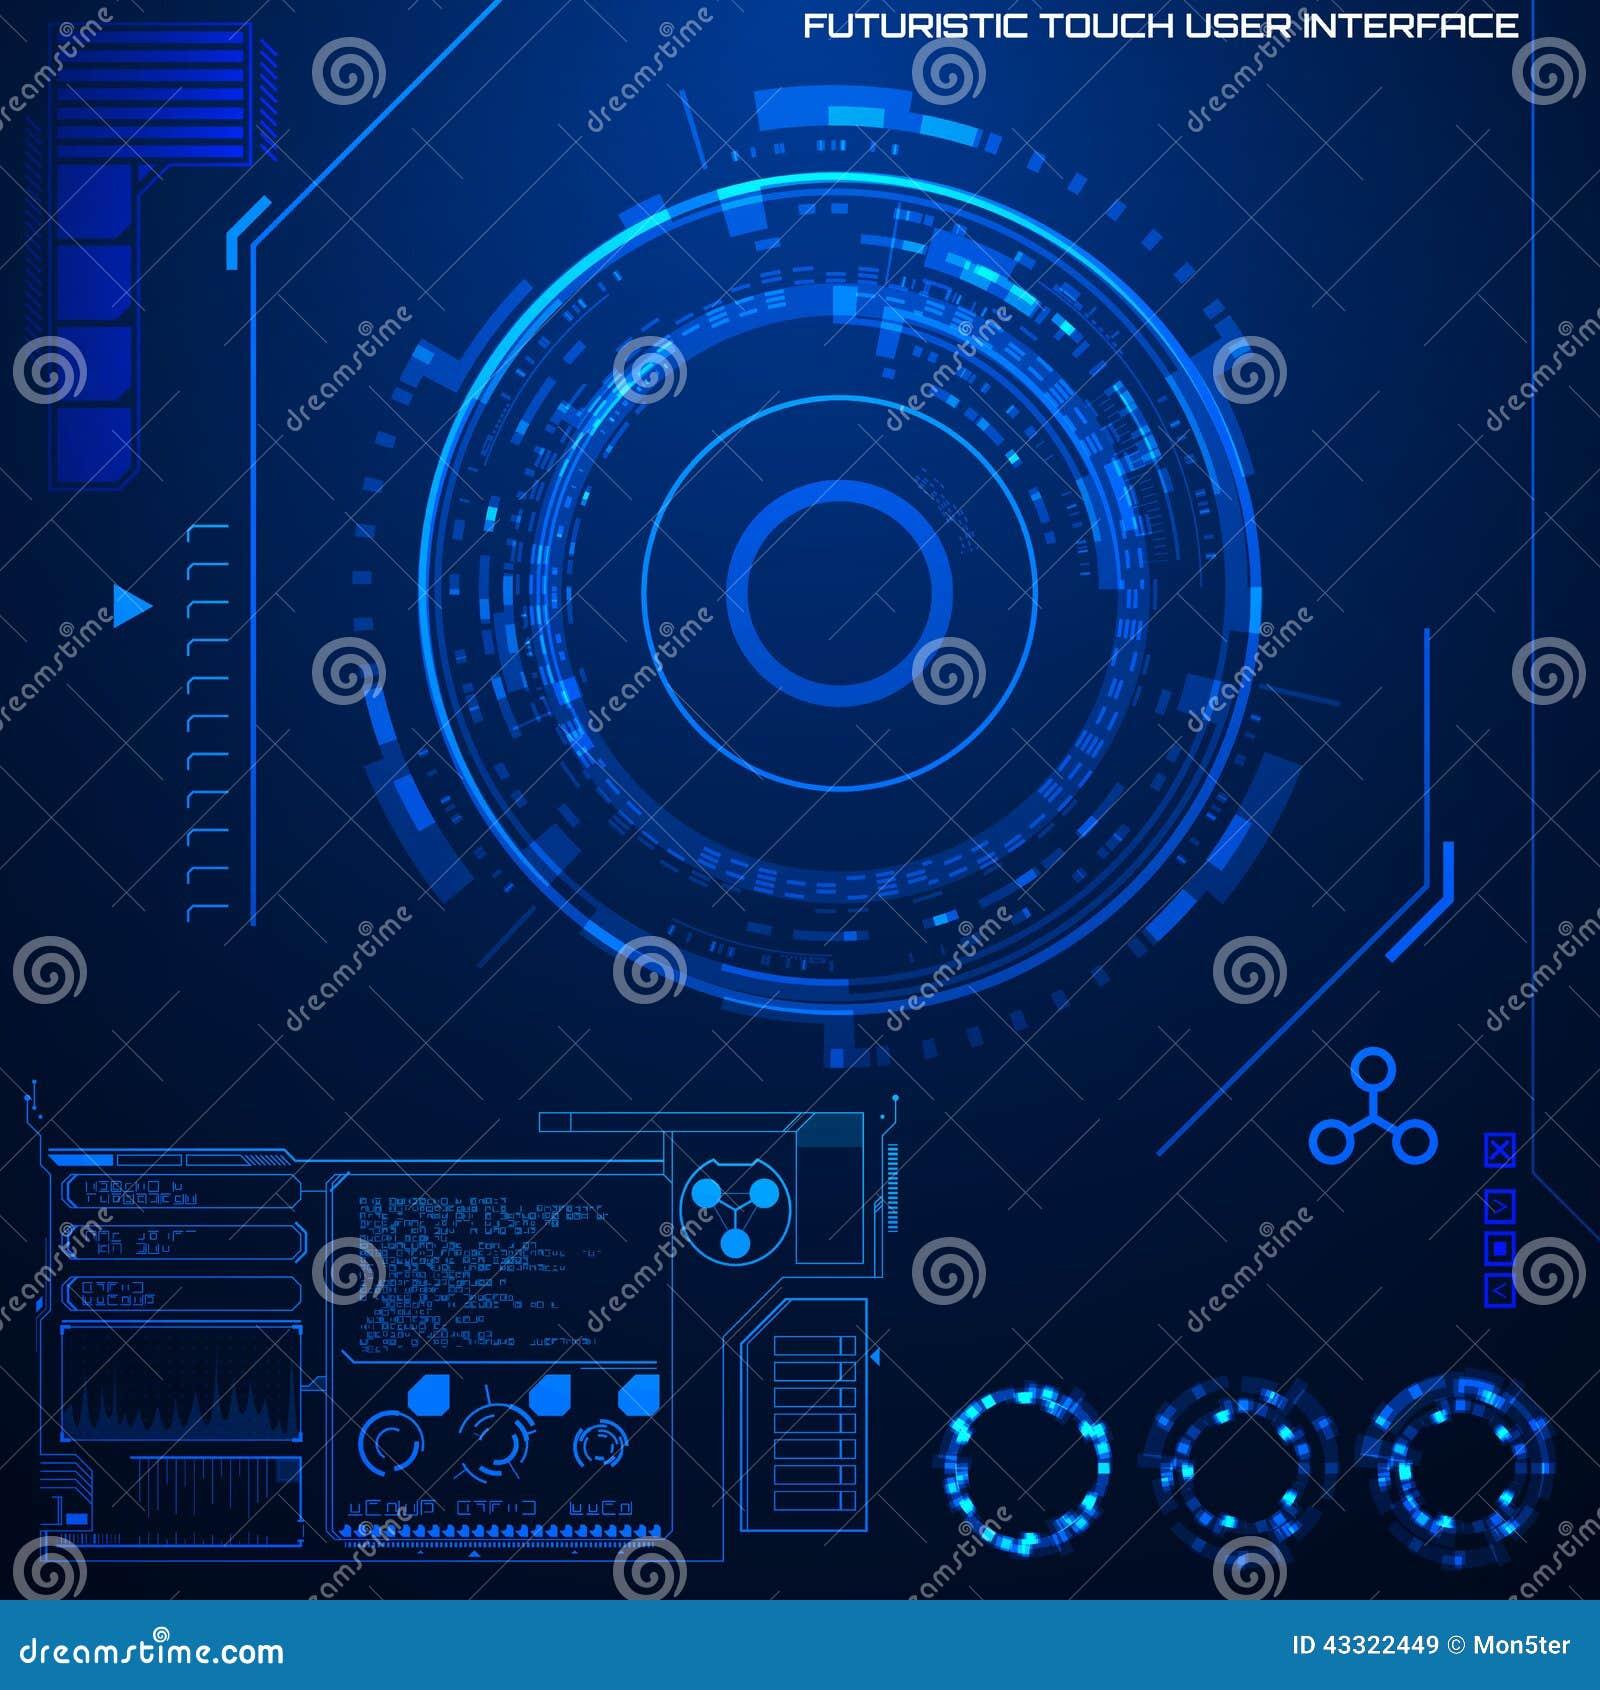 Interfaz de usuario gráfica futurista